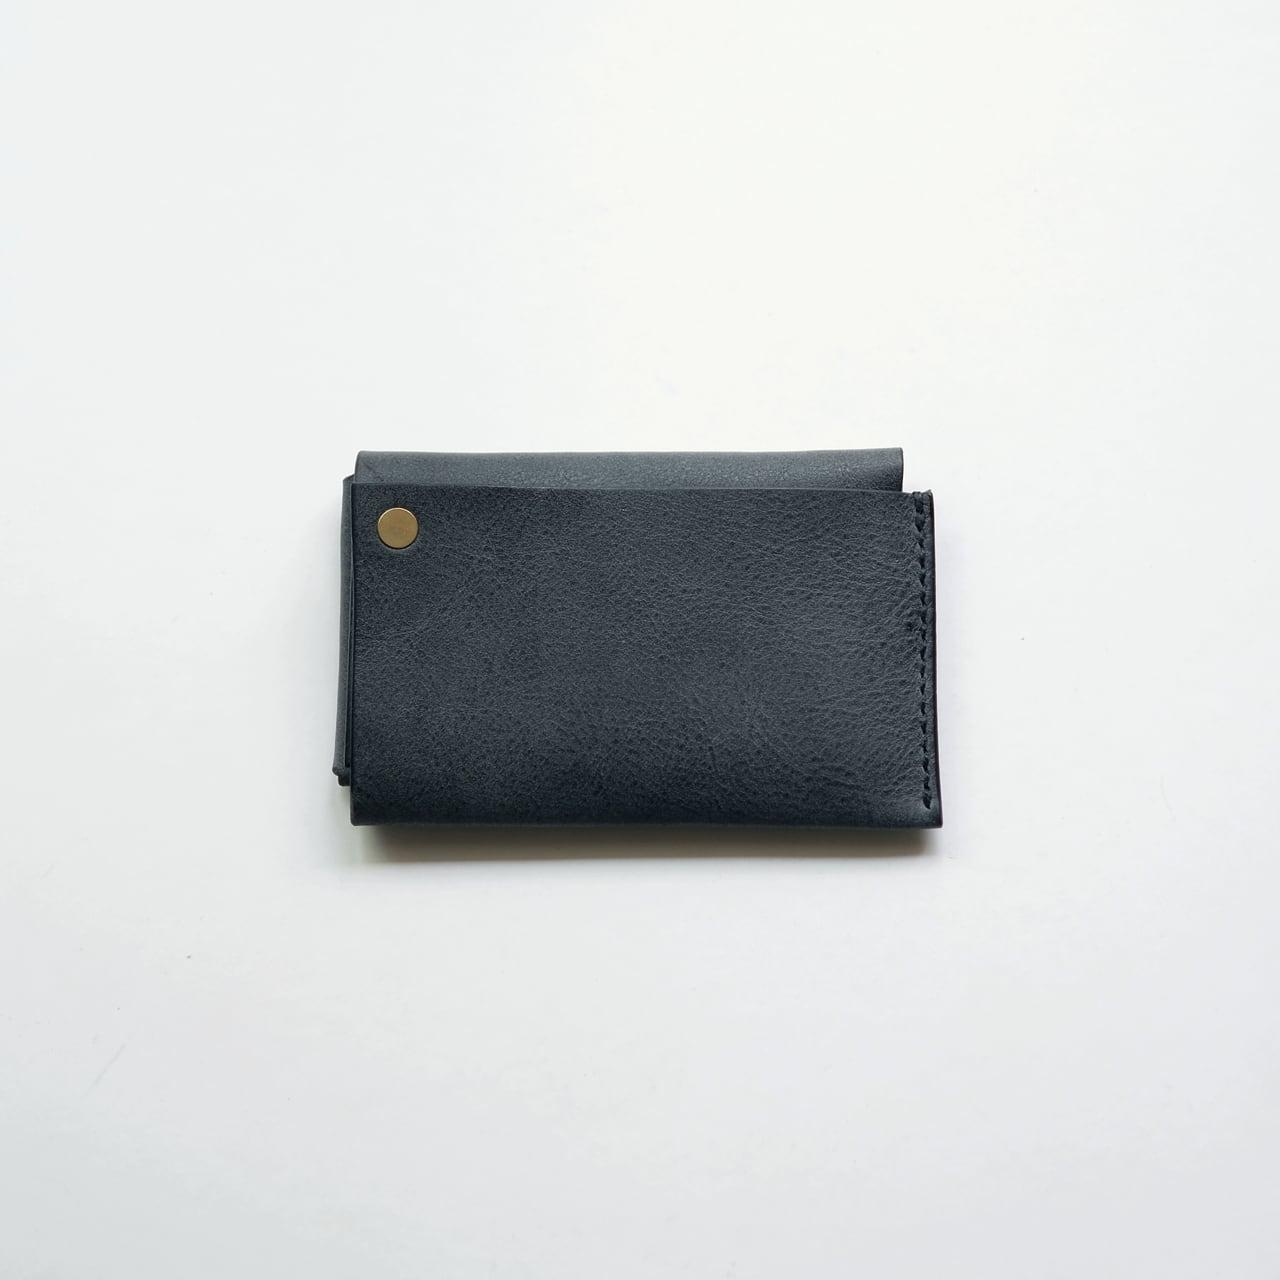 square wallet - bk - nebbia